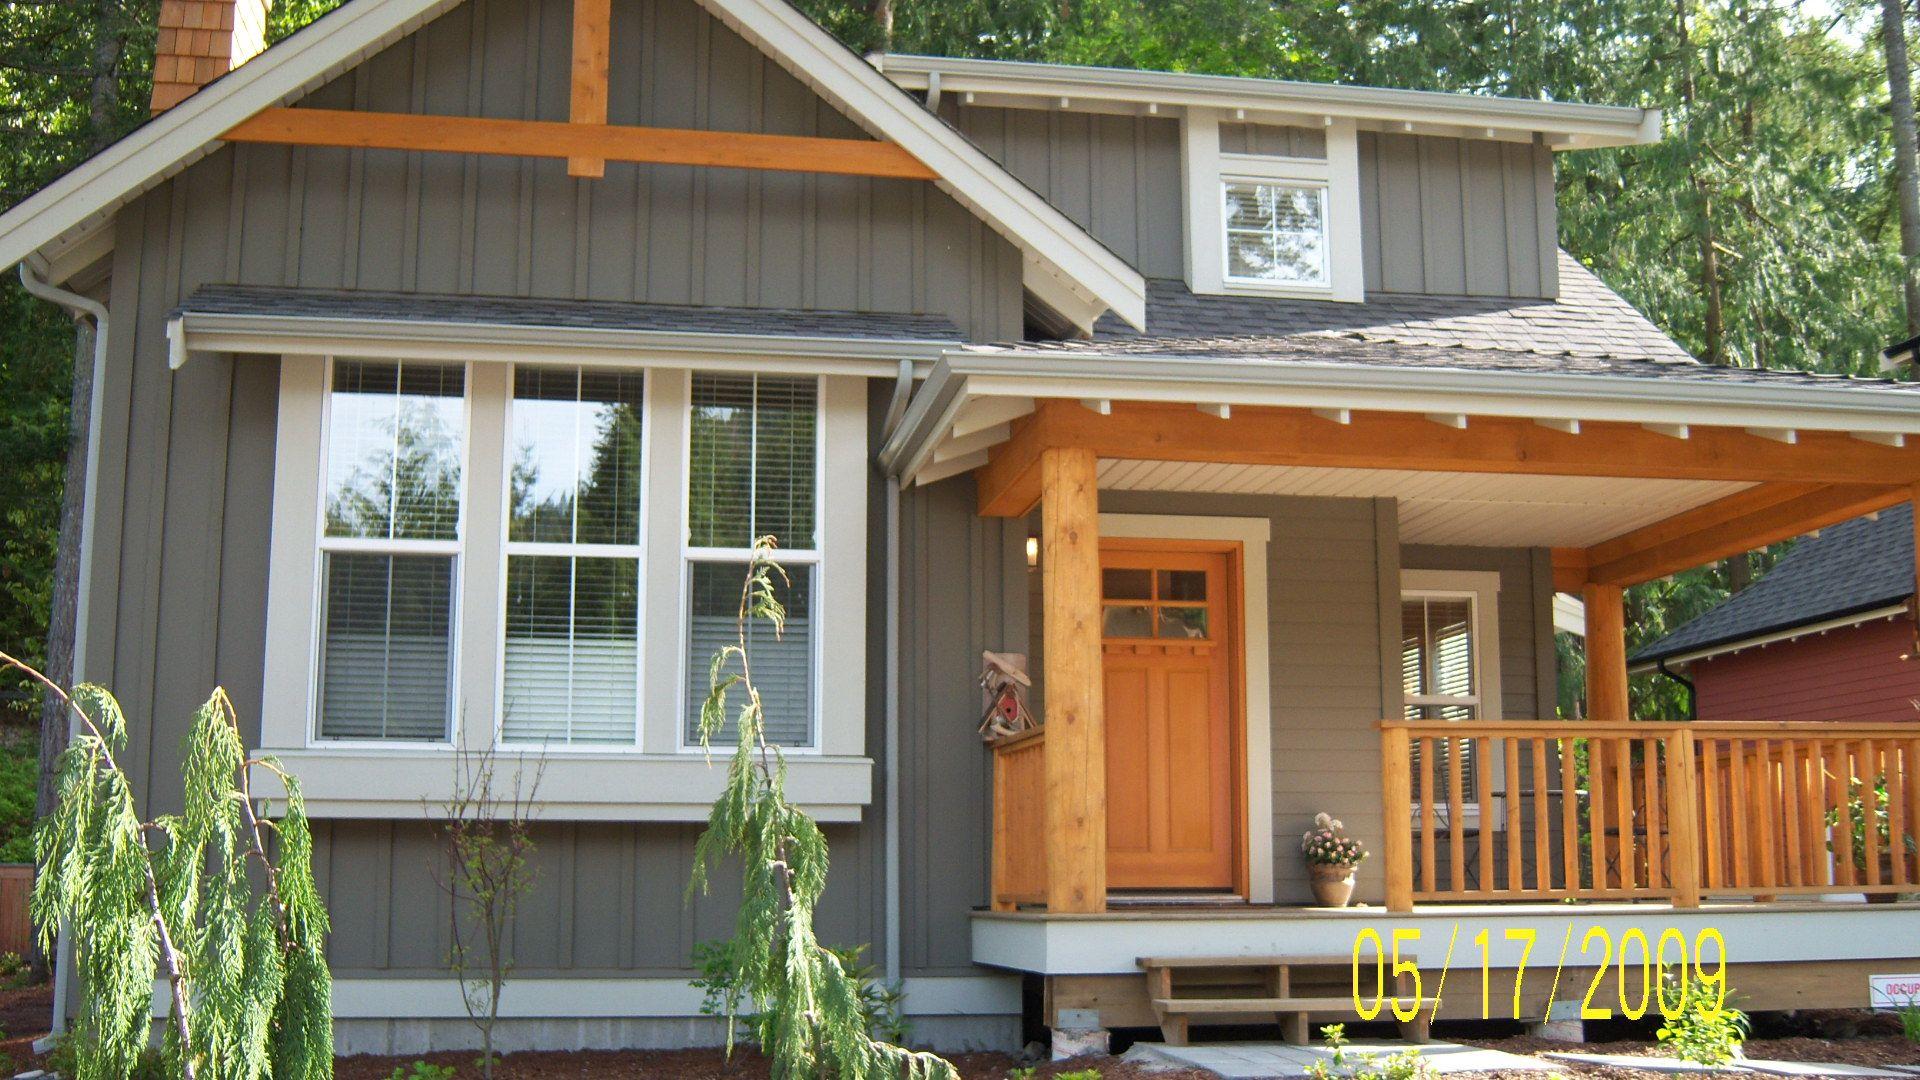 Remarkable Lake Cottage Cottage Vacation Rental By Owner Vrbo Home Interior And Landscaping Oversignezvosmurscom